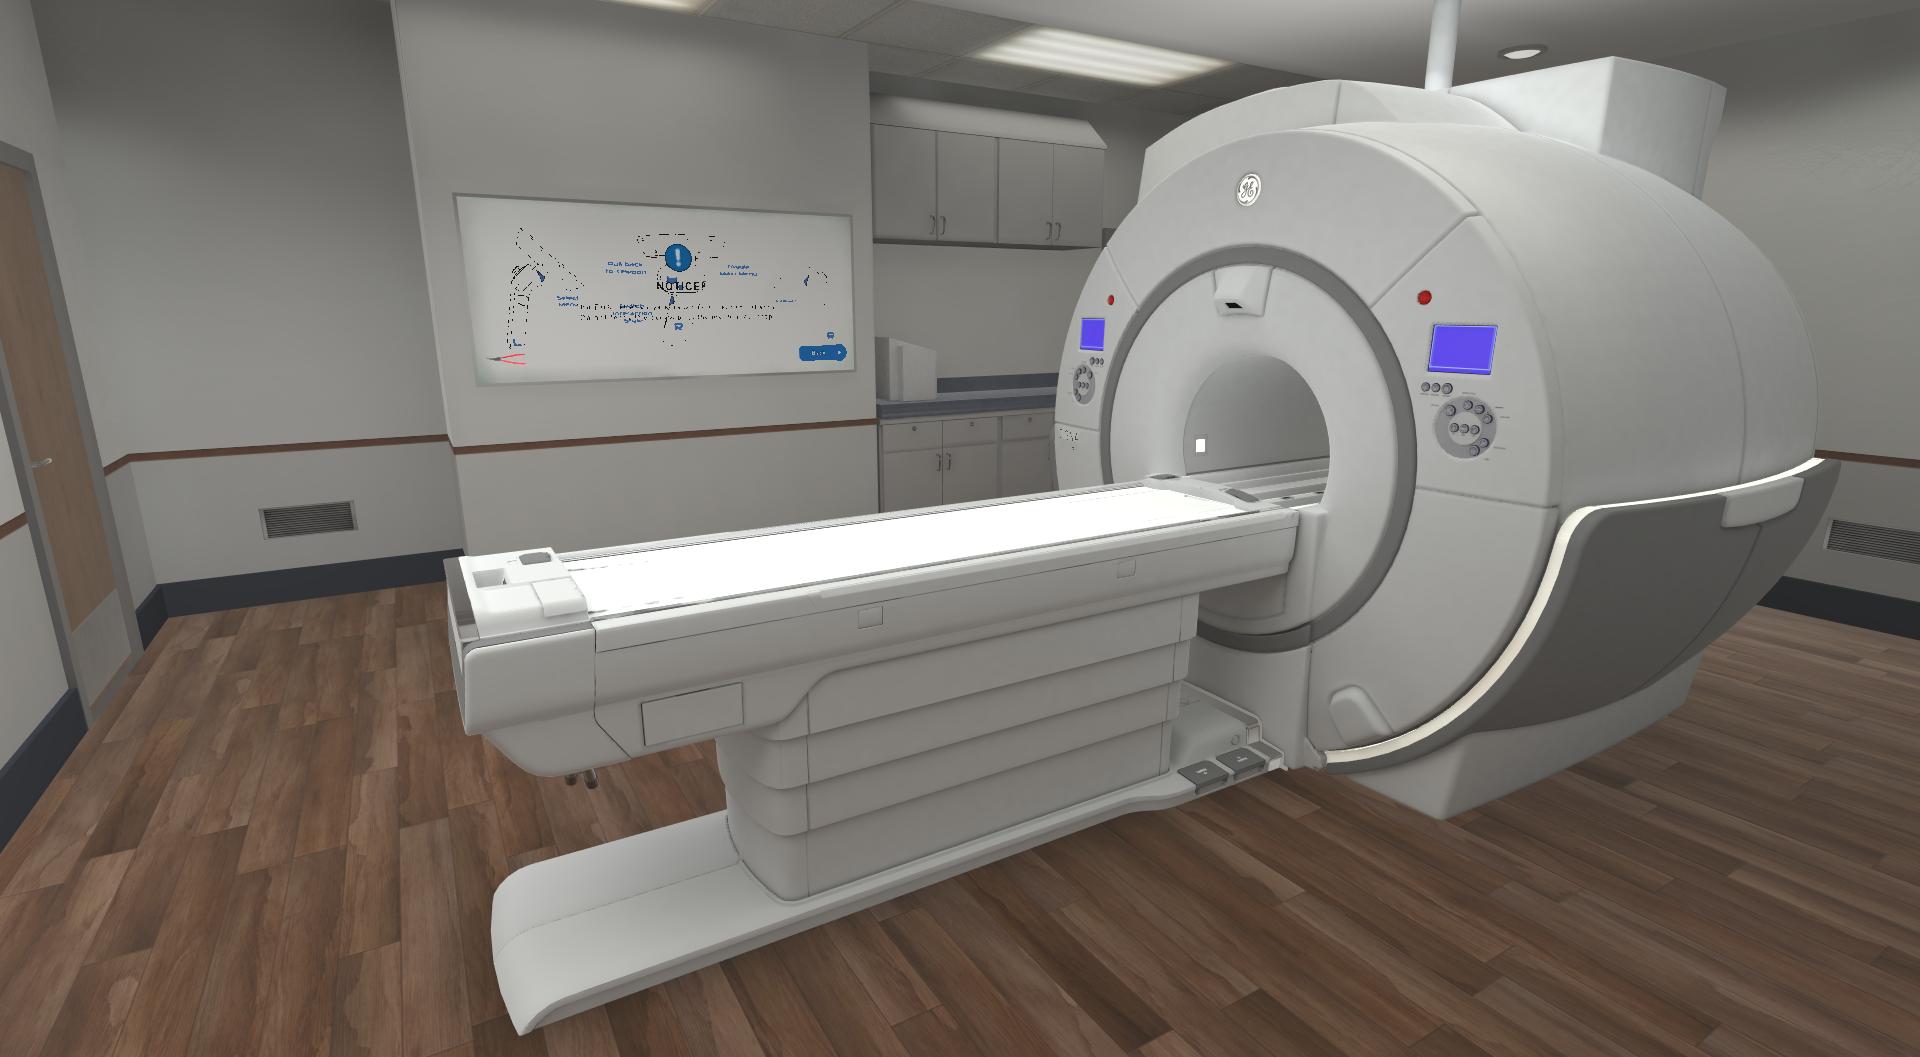 a CT Scan machine shown in virtual reality using Xplorer